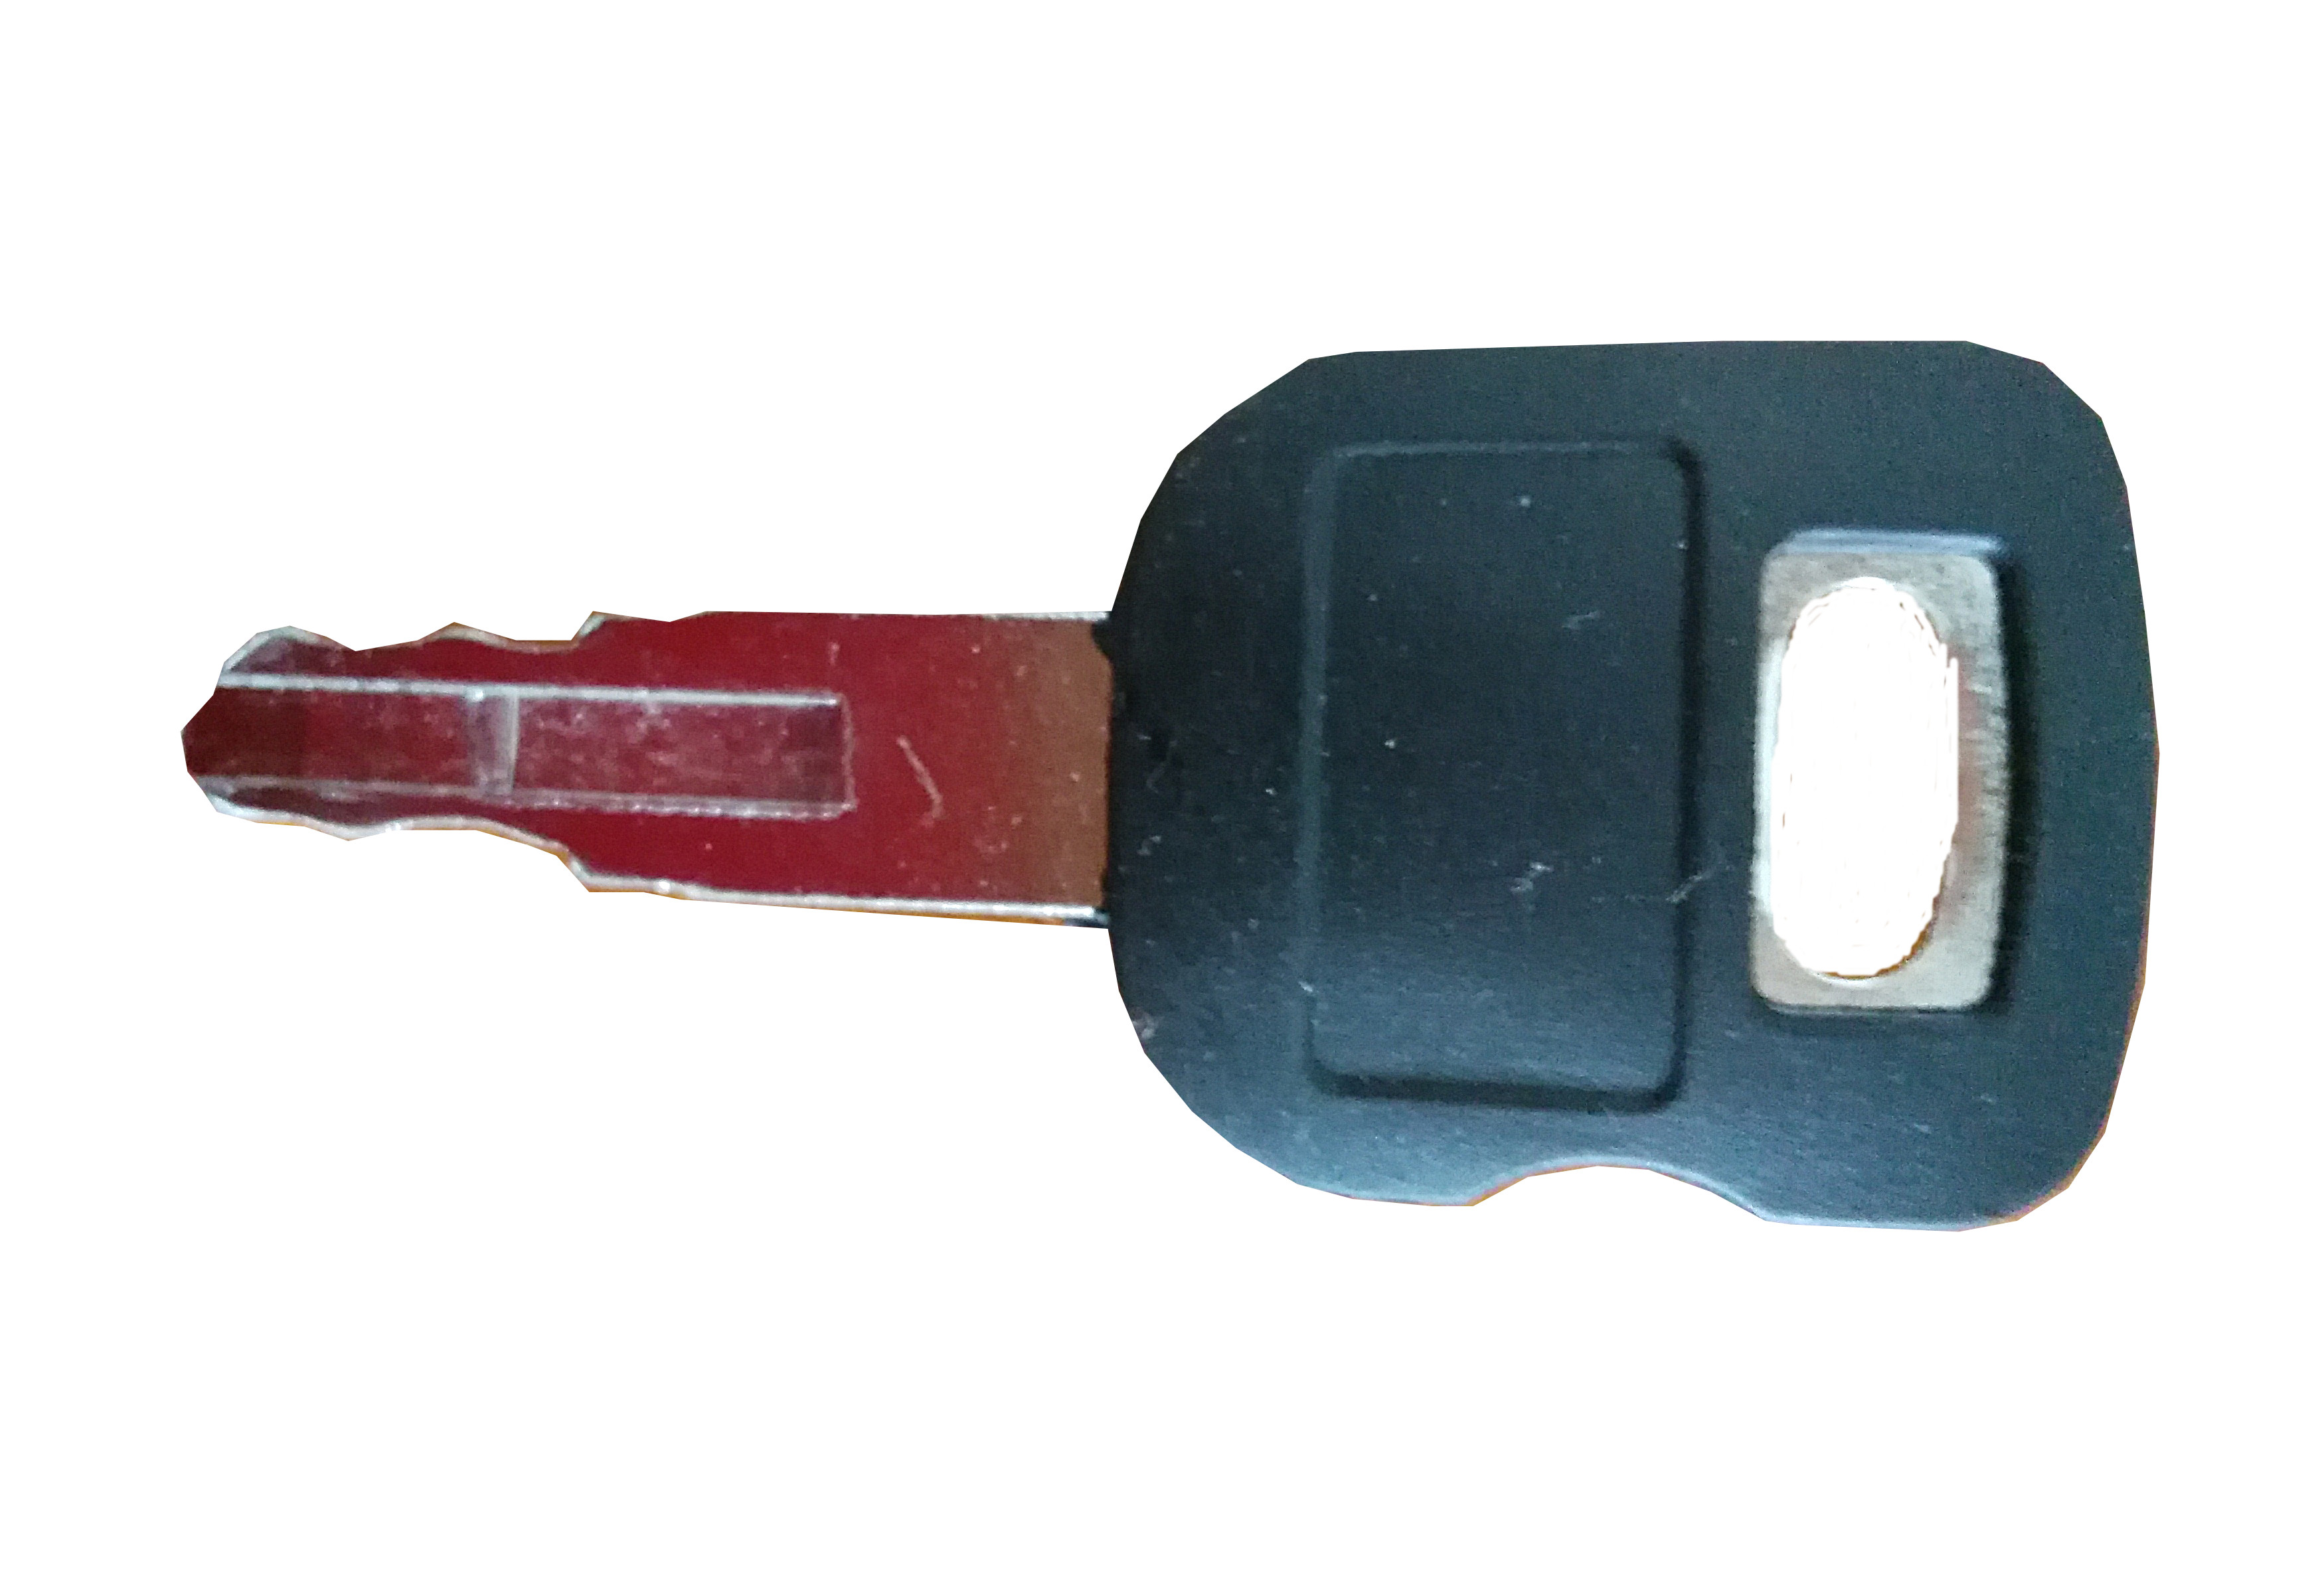 3e8a6390fba Klíč do strojů Caterpillar